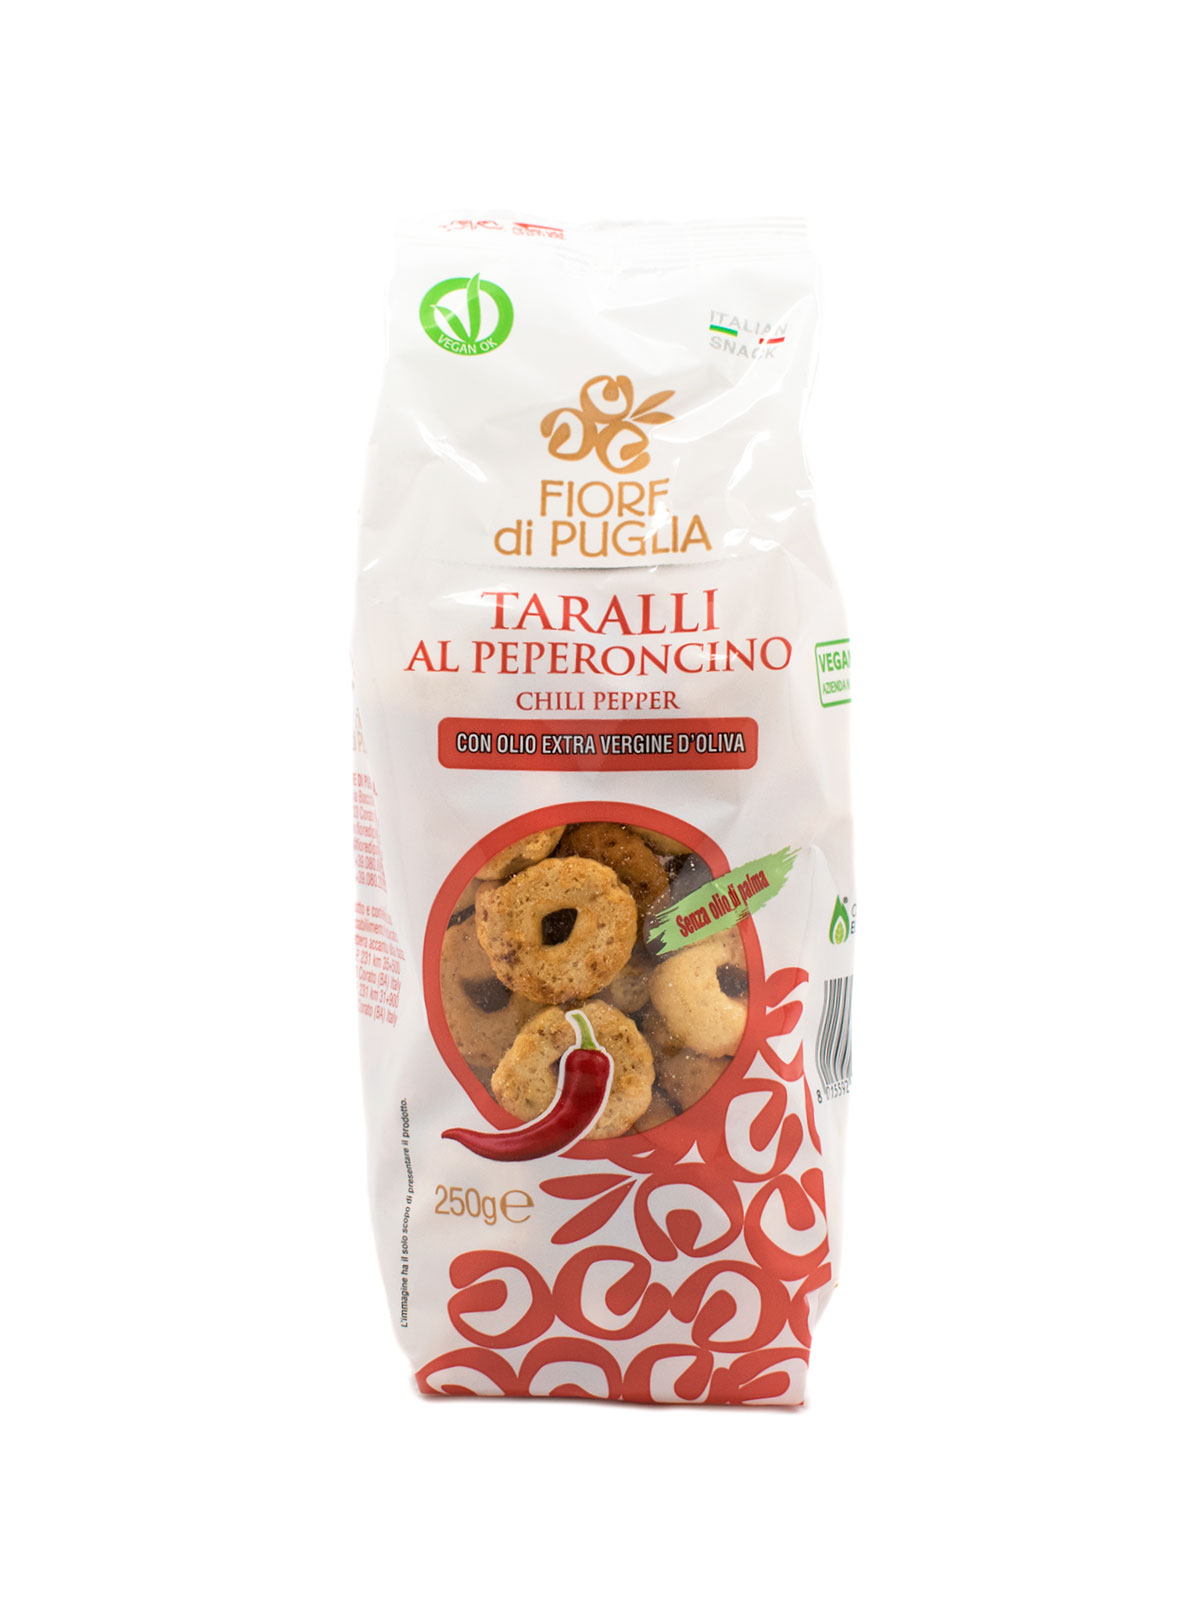 Taralli Chili Pepper Flavor - Sweets, Treats & Snacks - Buon'Italia